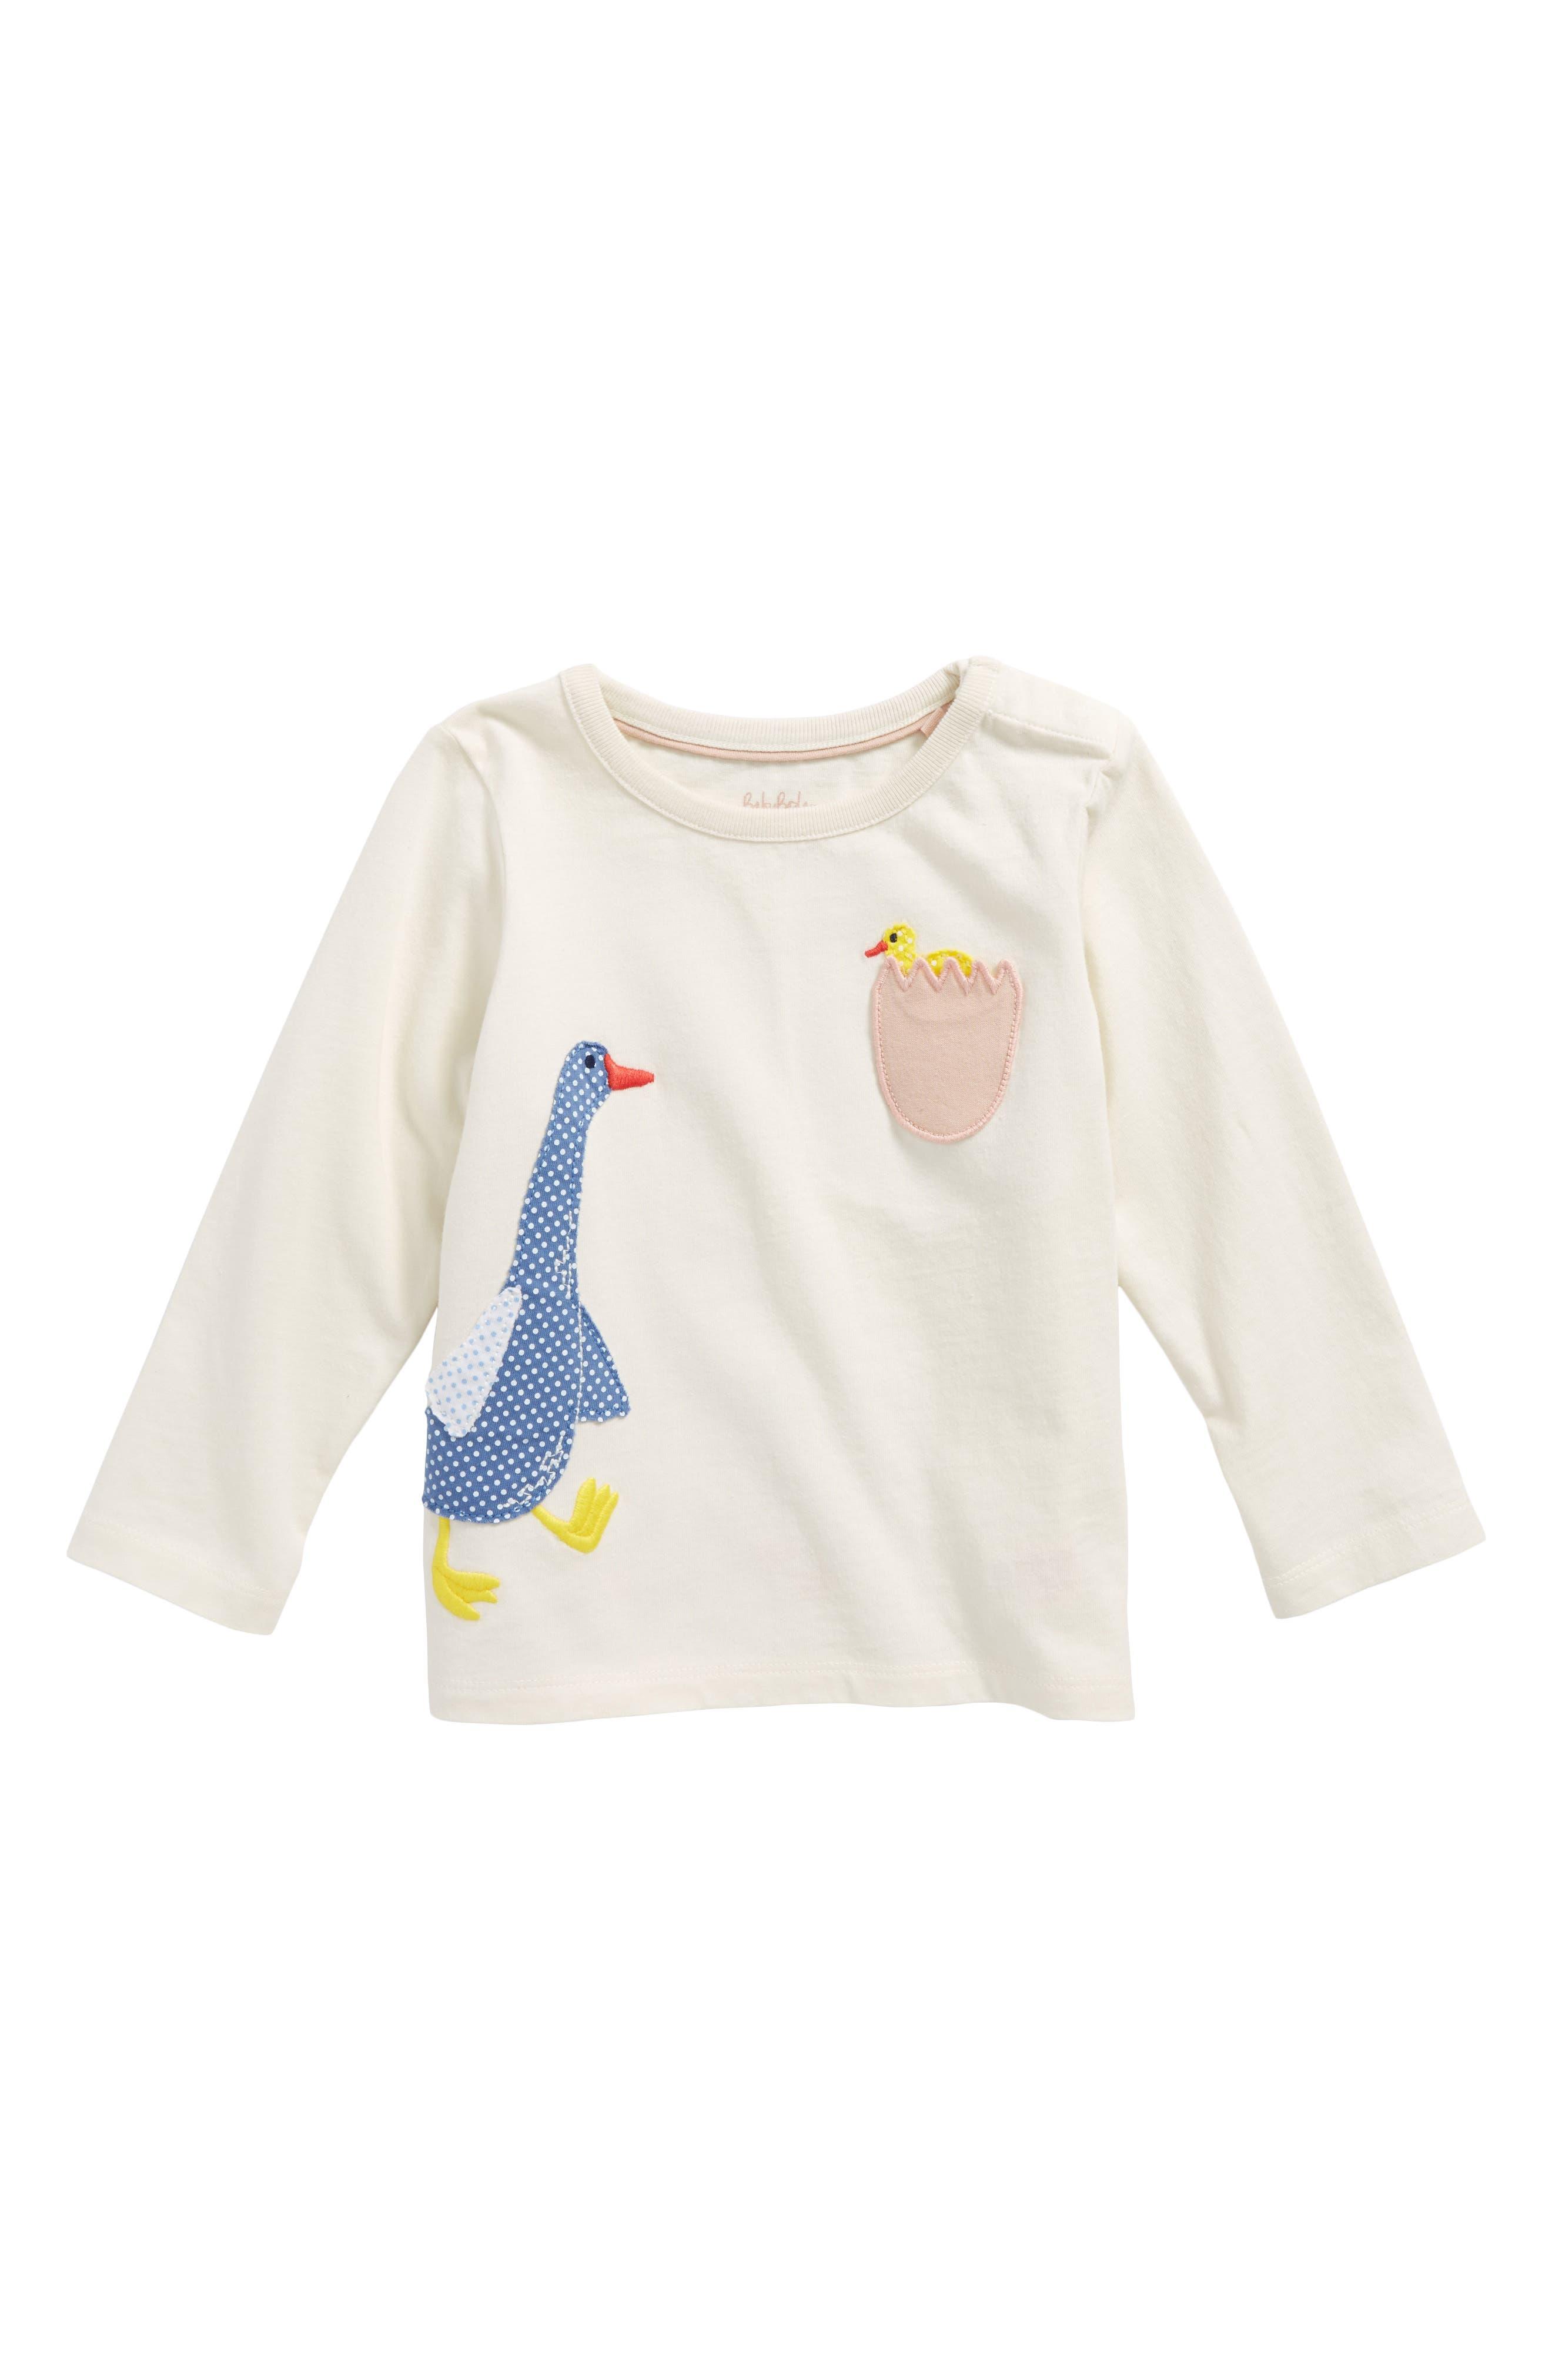 Alternate Image 1 Selected - Mini Boden Animal Appliqué Tee (Baby Girls & Toddler Girls)